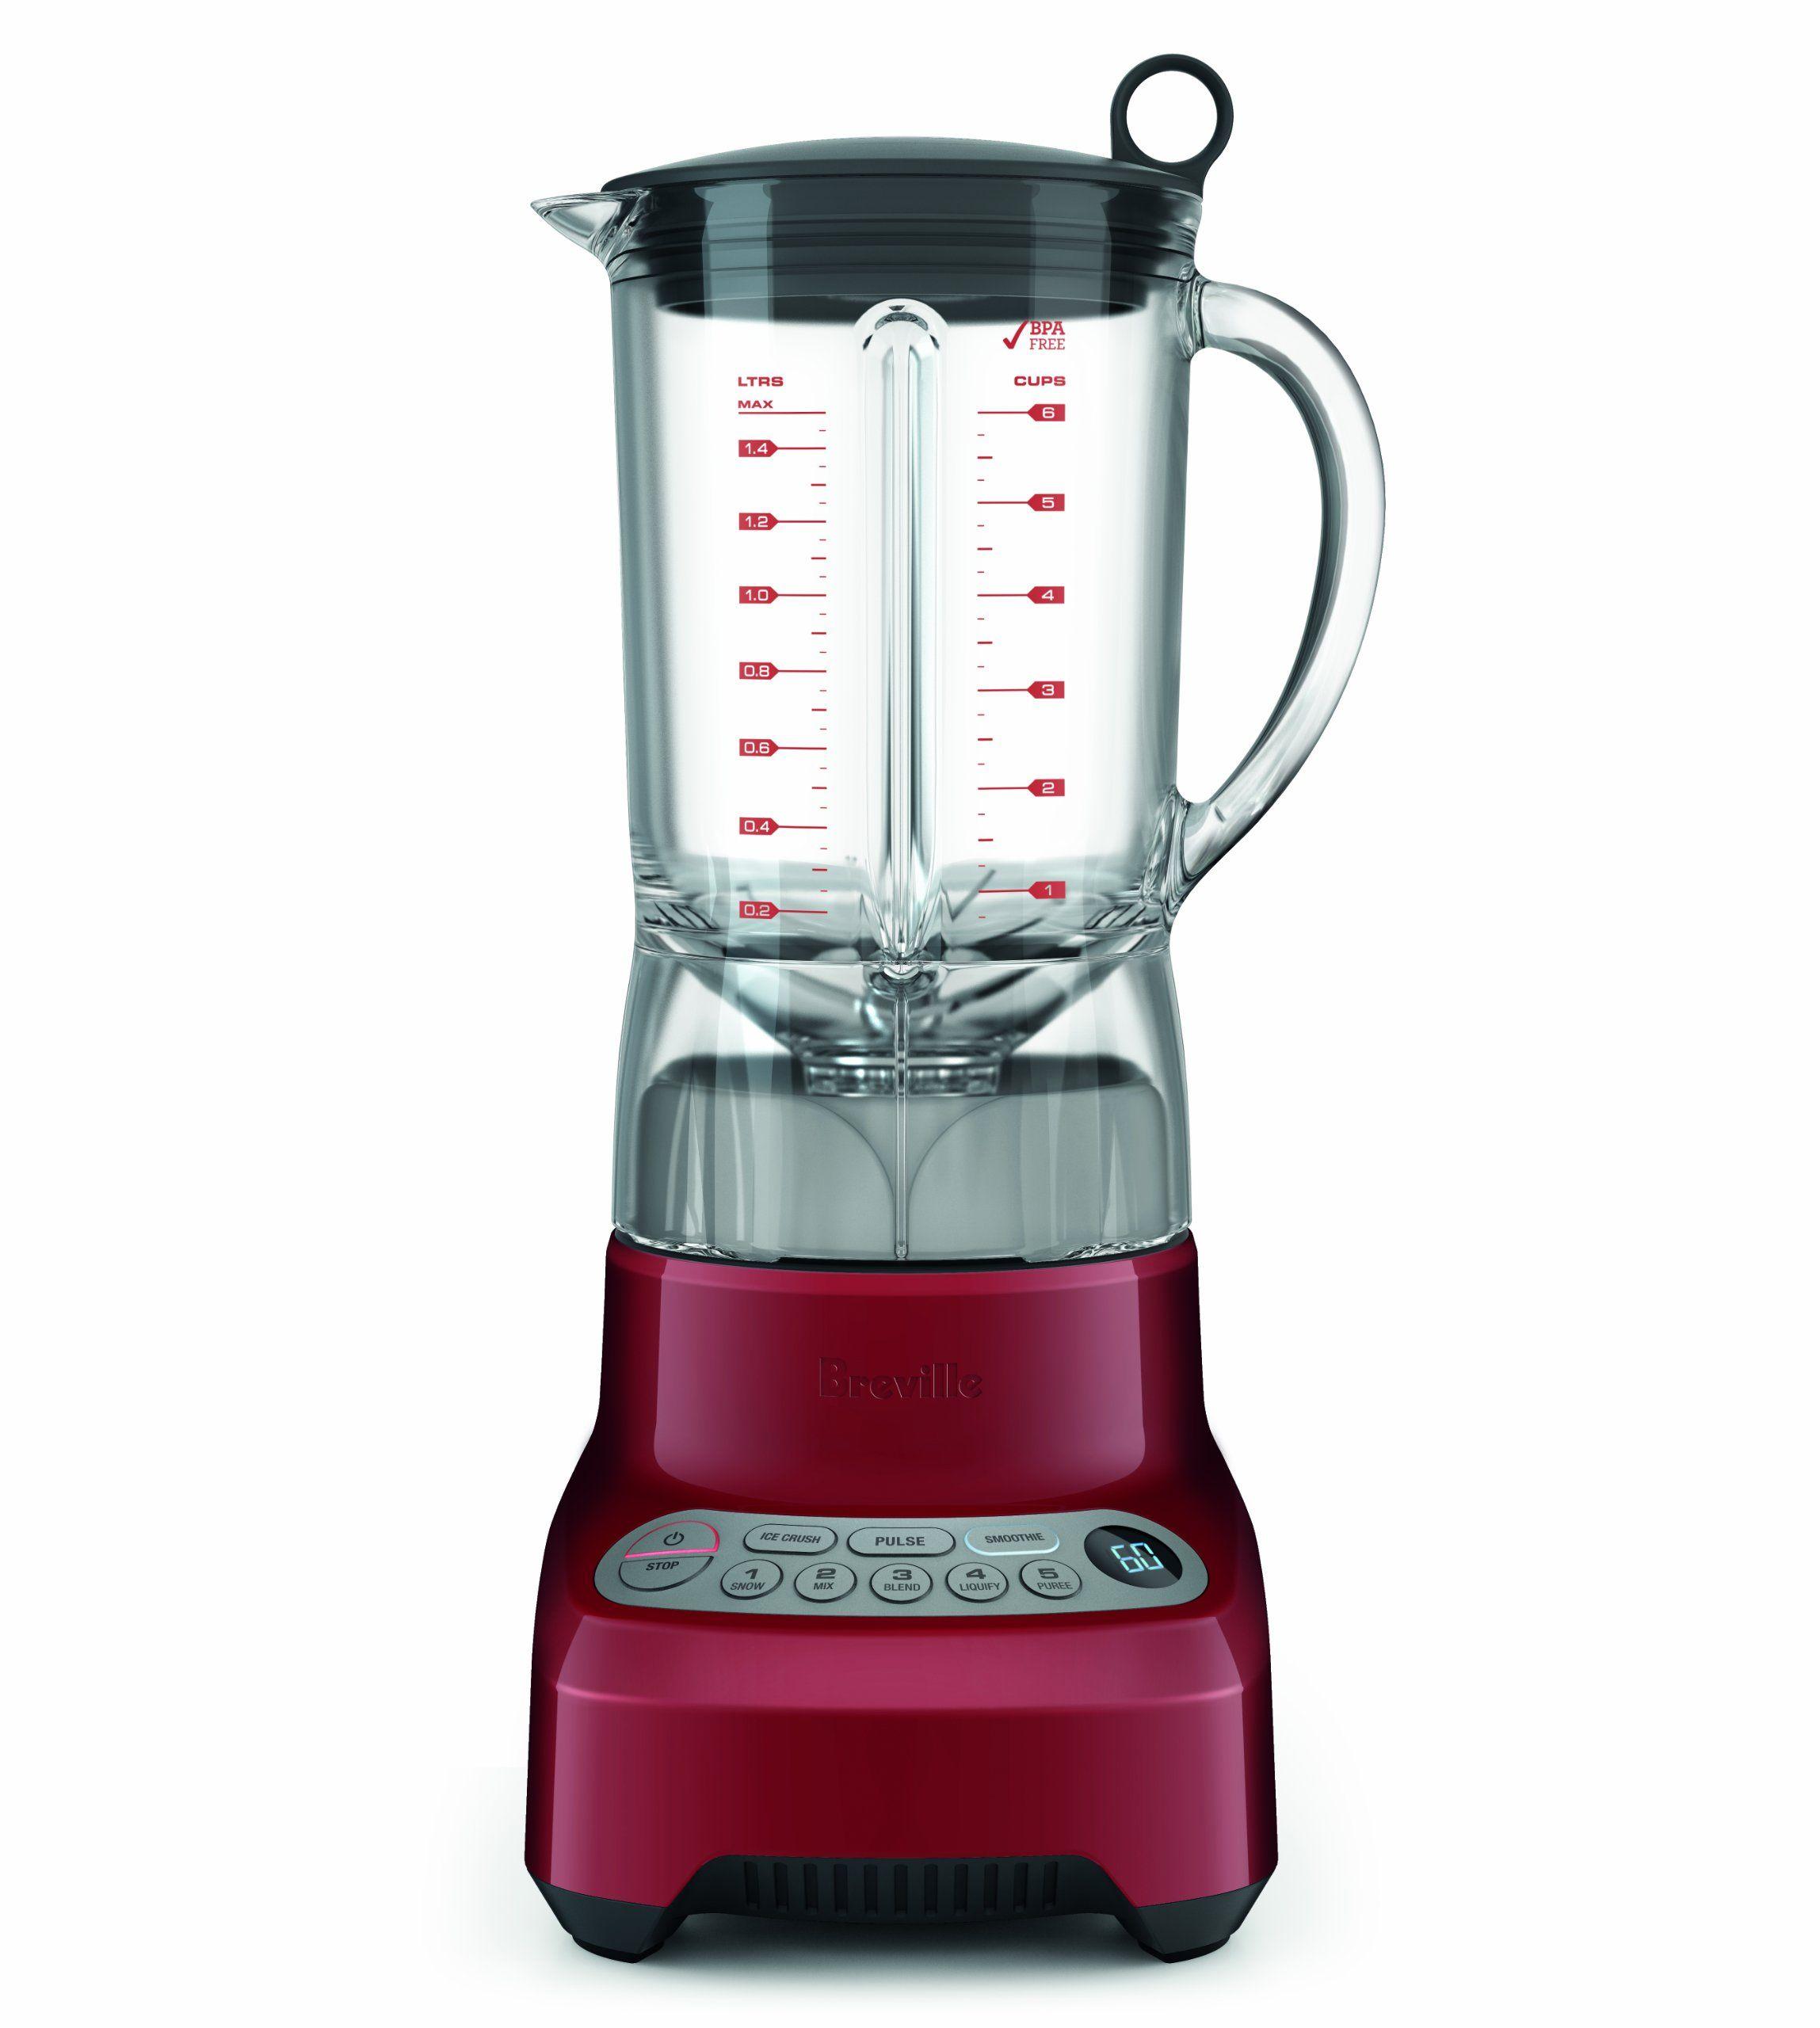 Amazon.com: Breville BBL605XL Hemisphere Control Blender: Electric Countertop Blenders: Kitchen & Dining